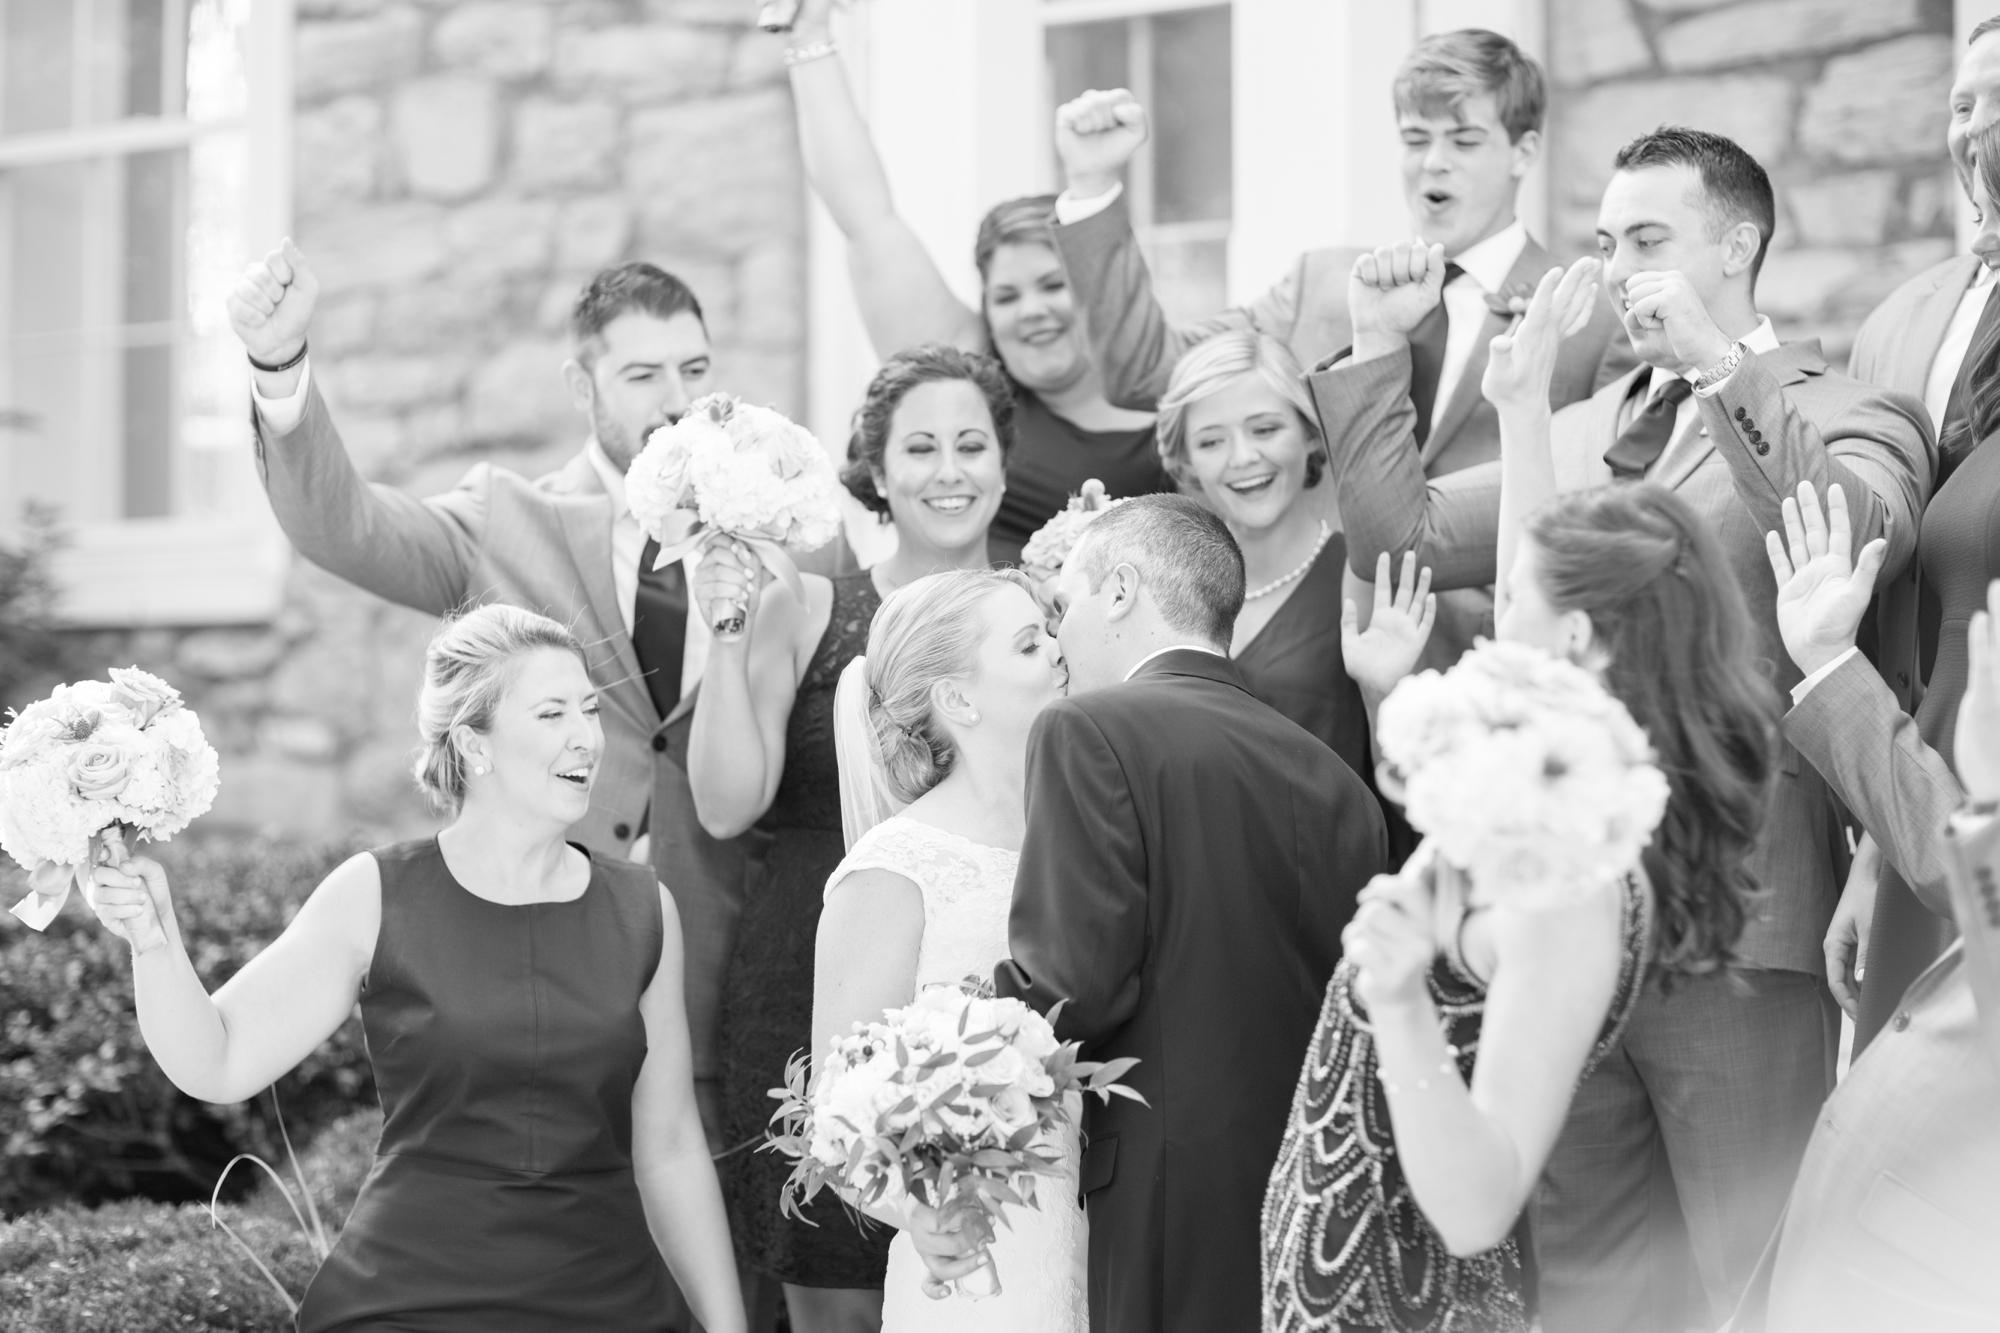 4-Miano Wedding Bridal Party-356_anna grace photography maryland wedding photographer rockland estates.jpg